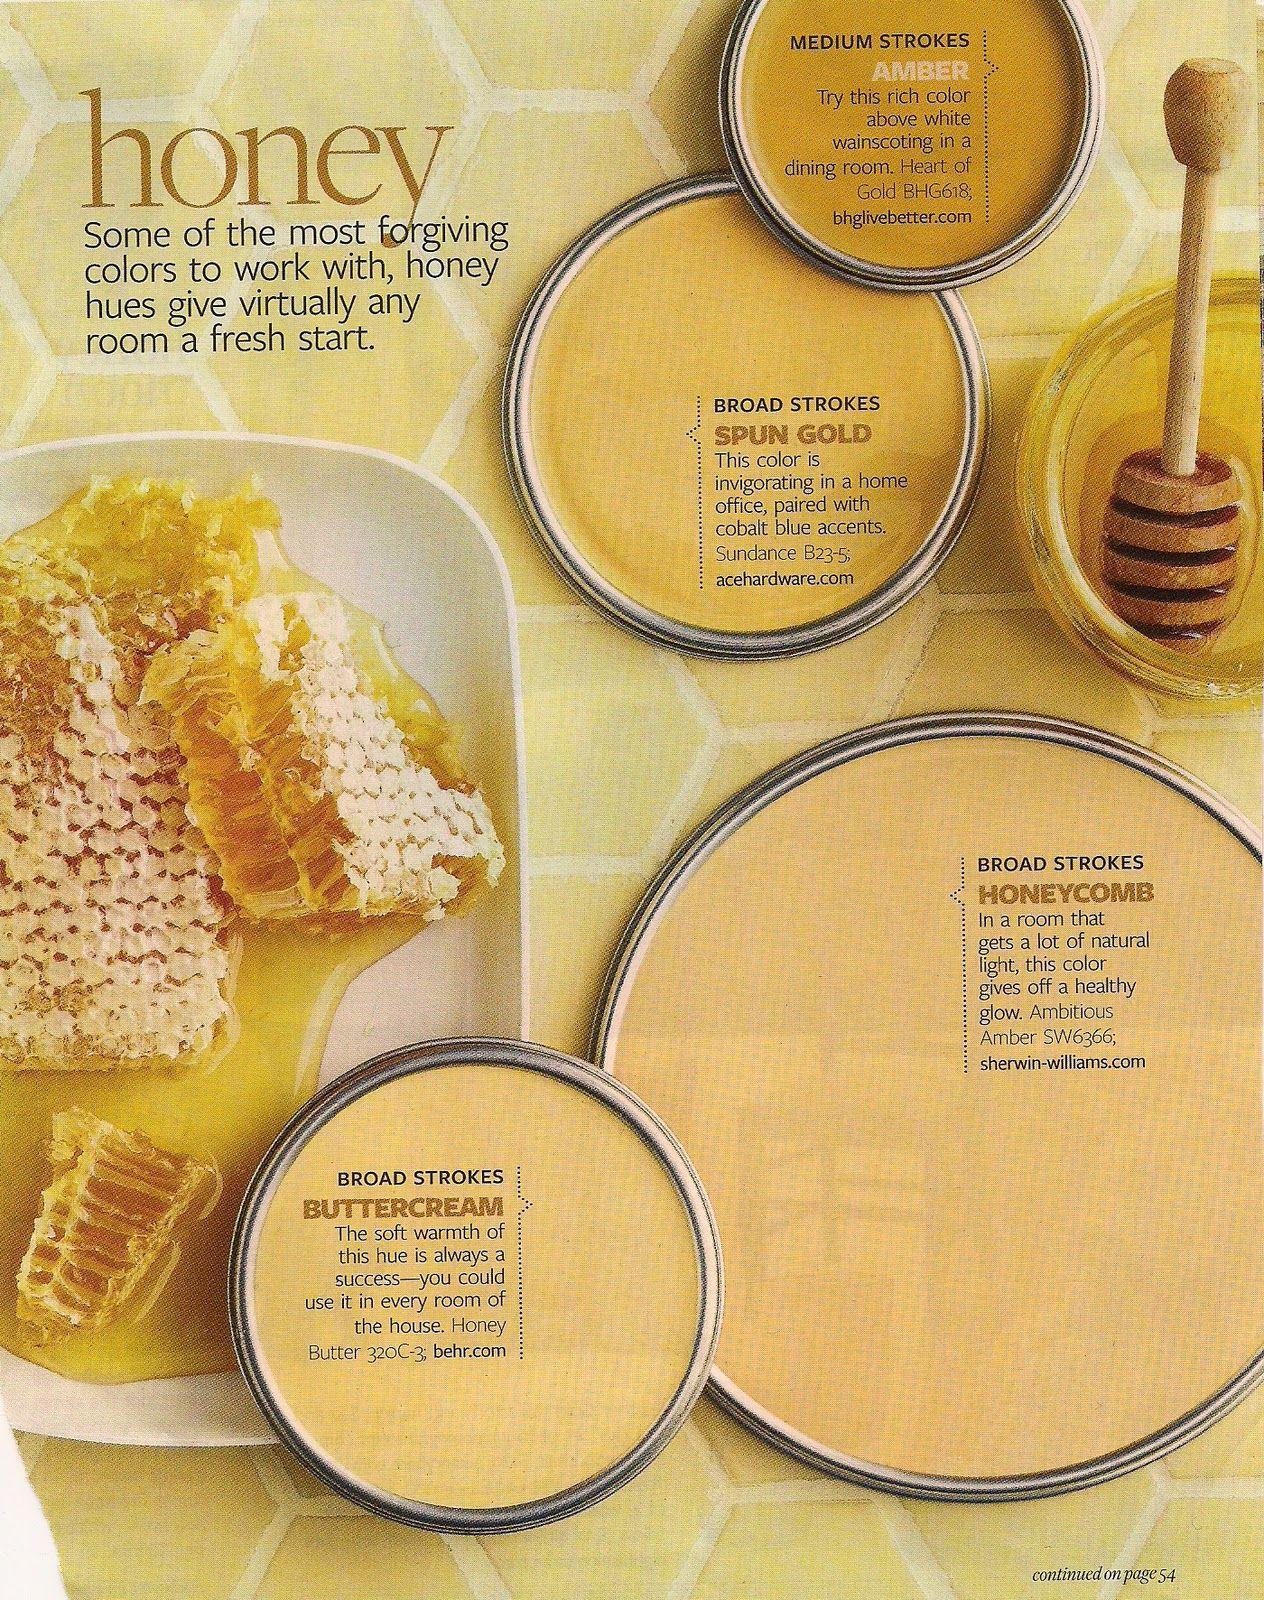 honey tones | Color My World | Pinterest | Honey, House and Paint ideas